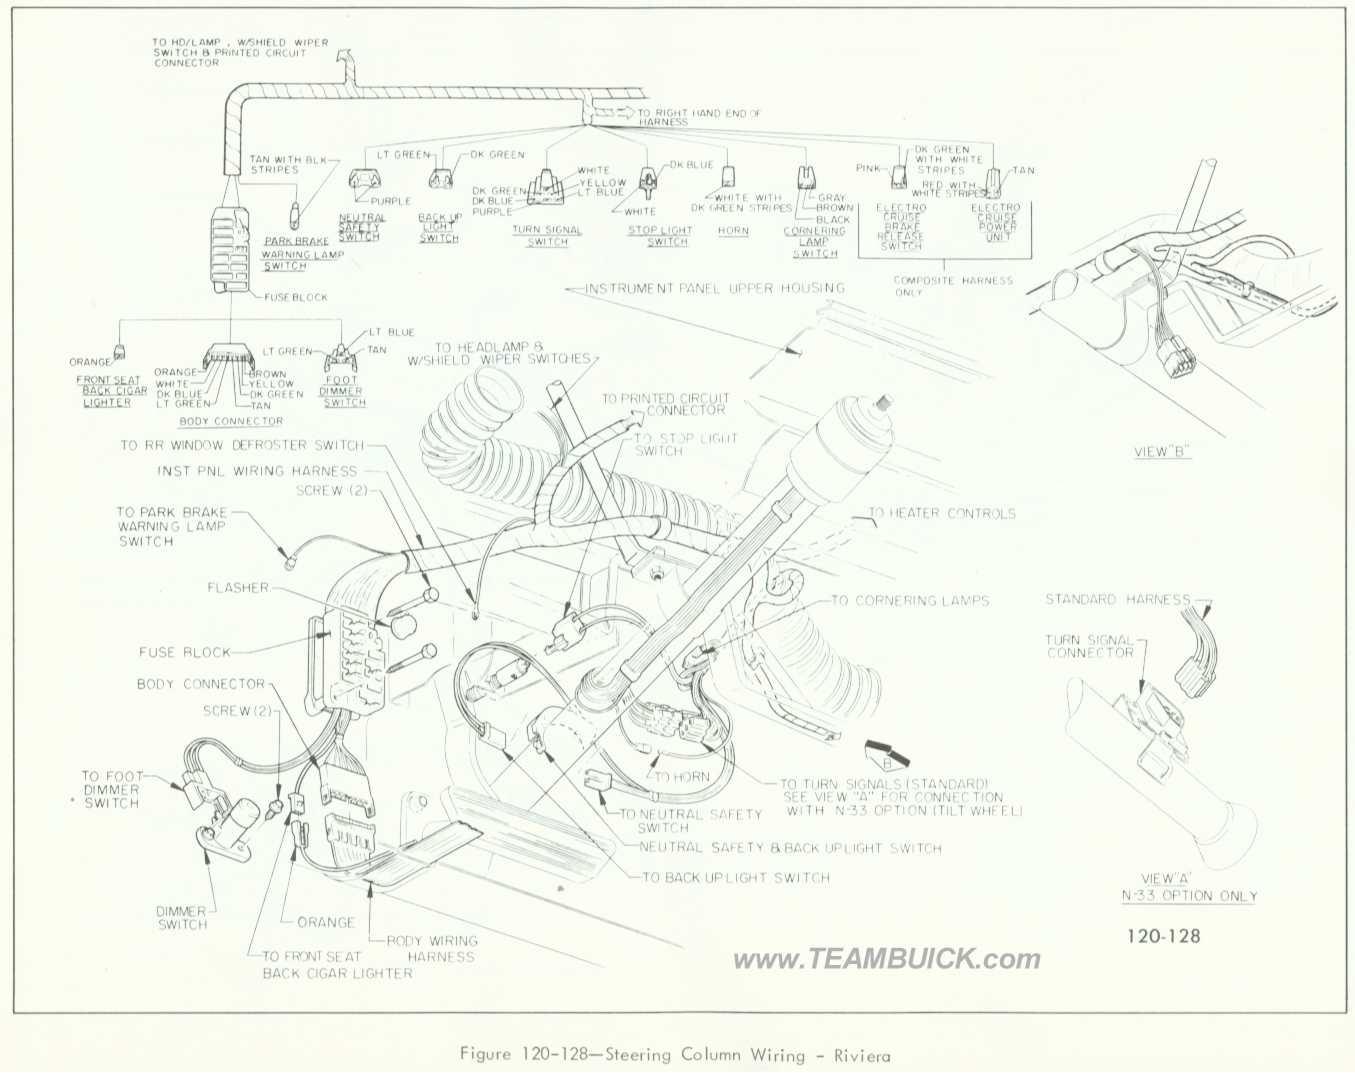 96 buick riviera wiring diagram